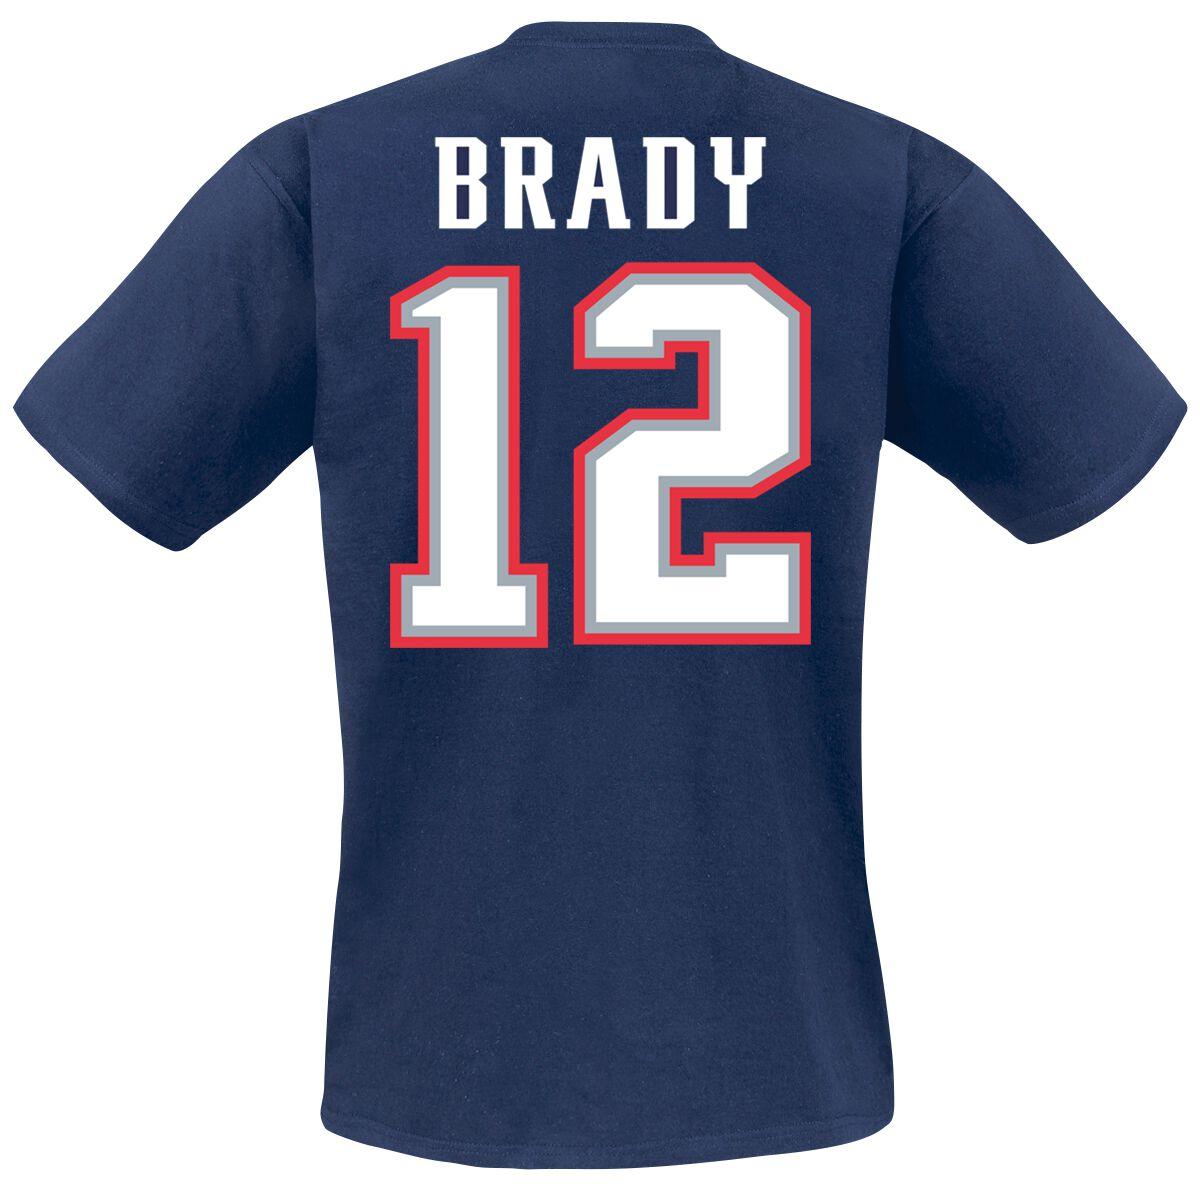 save off 88d4b 436a0 New England Patriots Brady #12